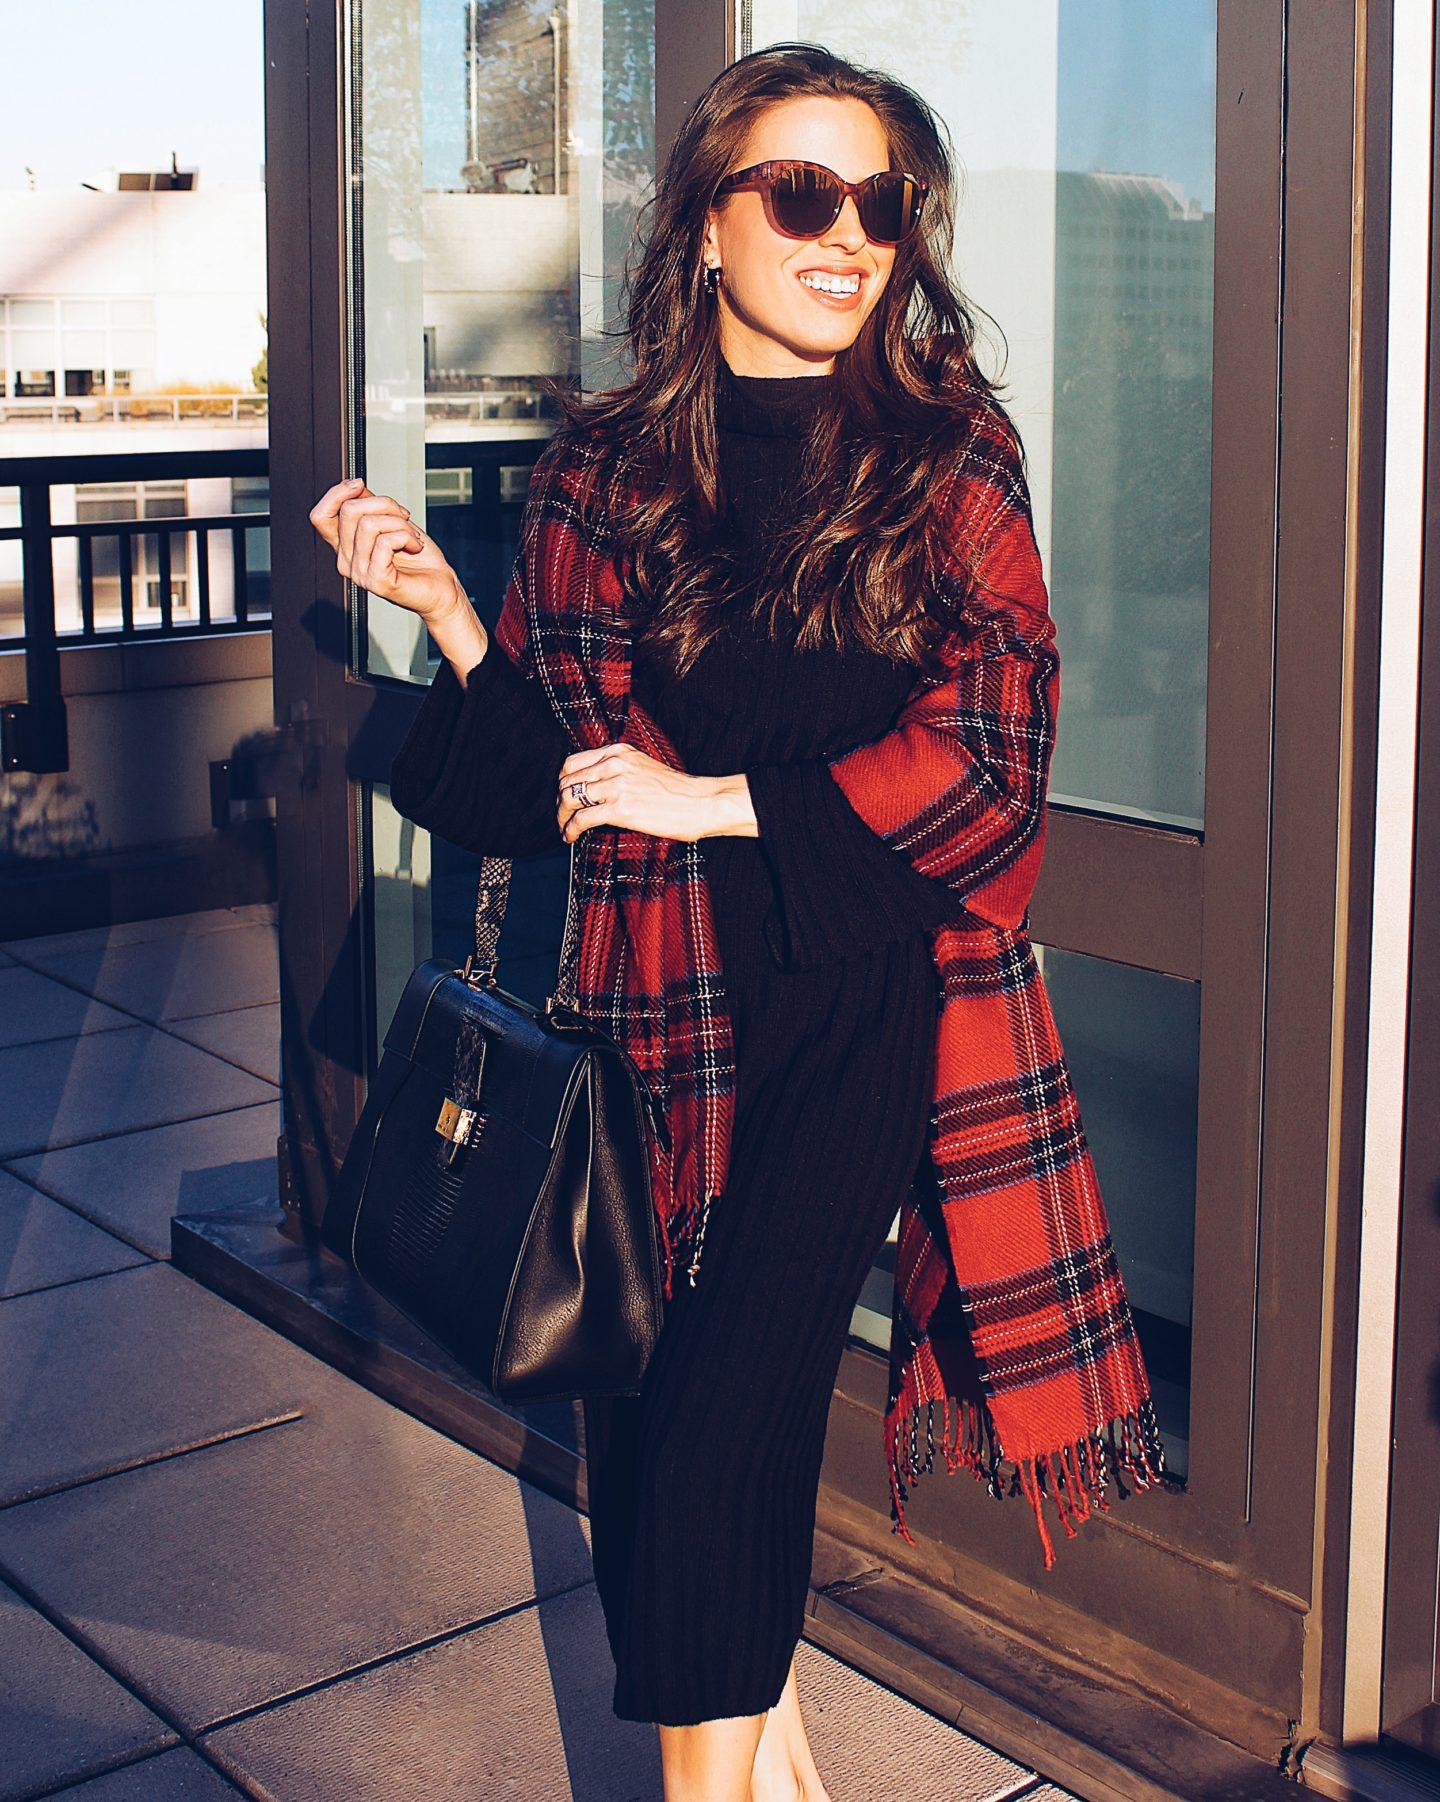 sweater dress outfit idea - ana florentina